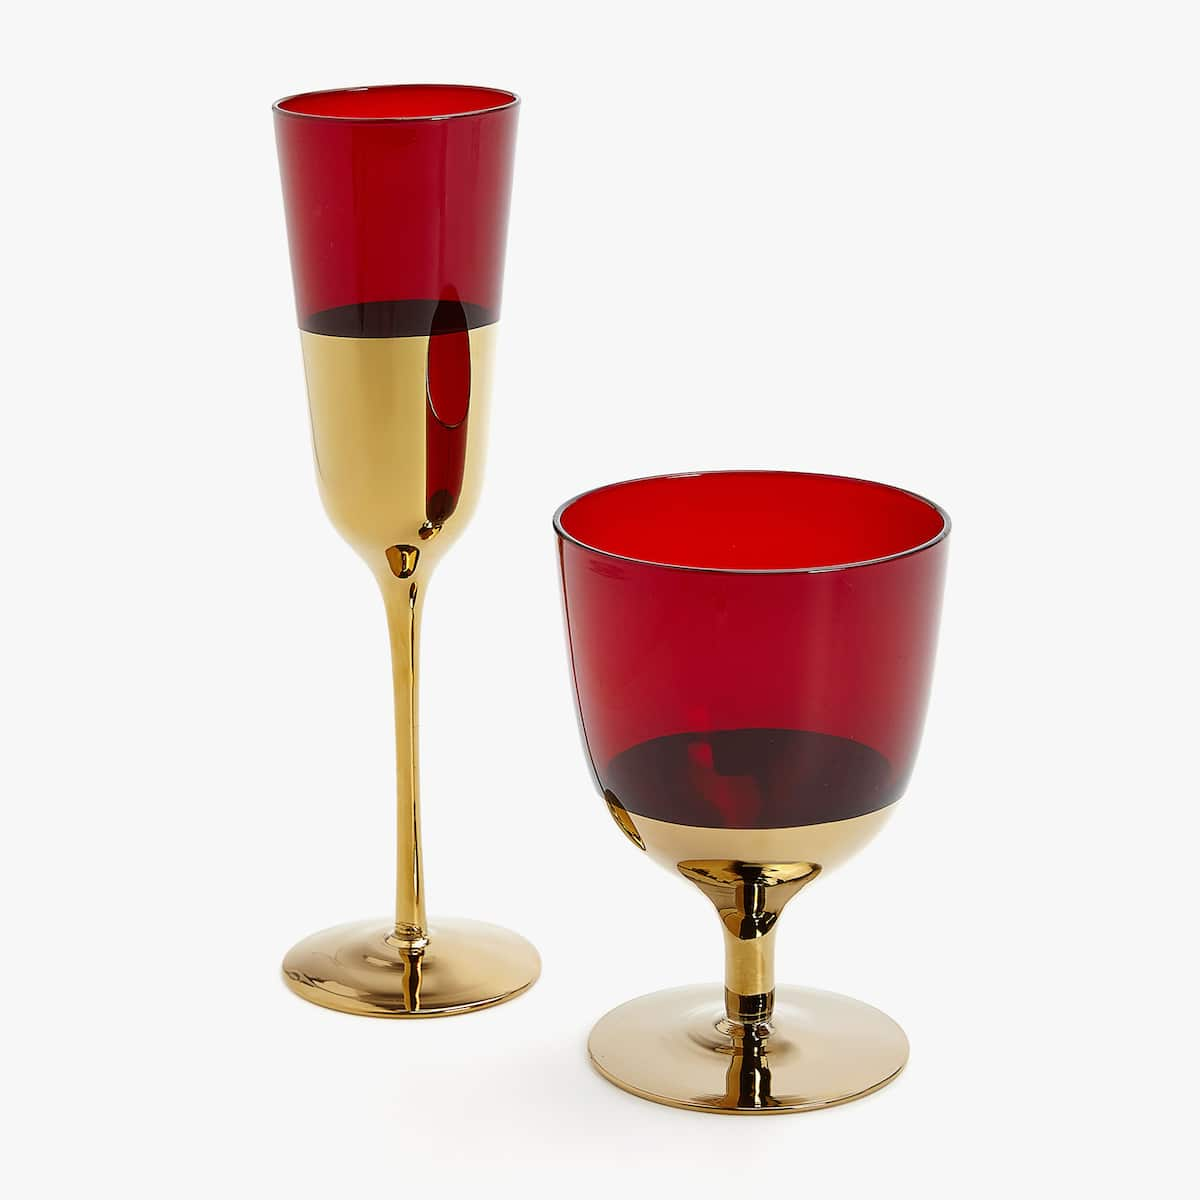 Cristaler A Roja Base Dorada Vasos Cristaler A Comedor  # Champagne Muebles Uy